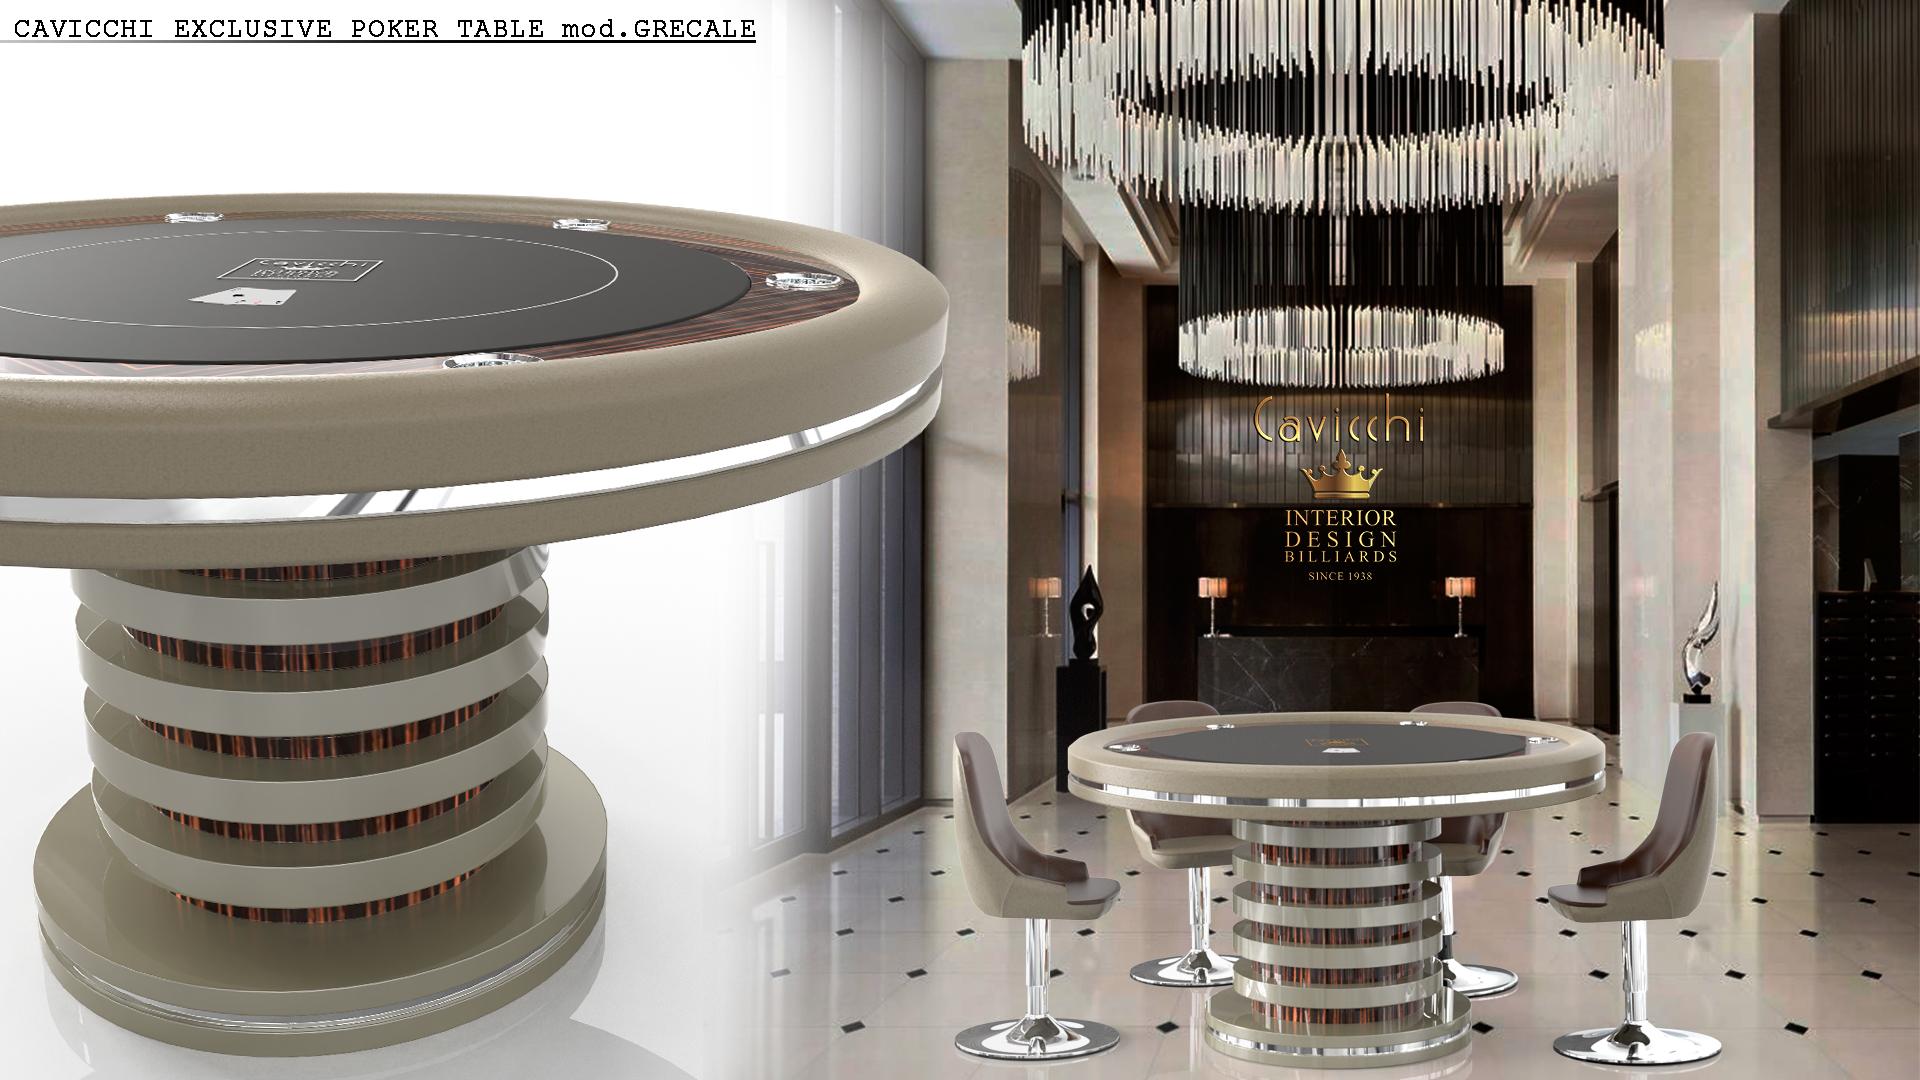 Poker Table Grecale WL14 1